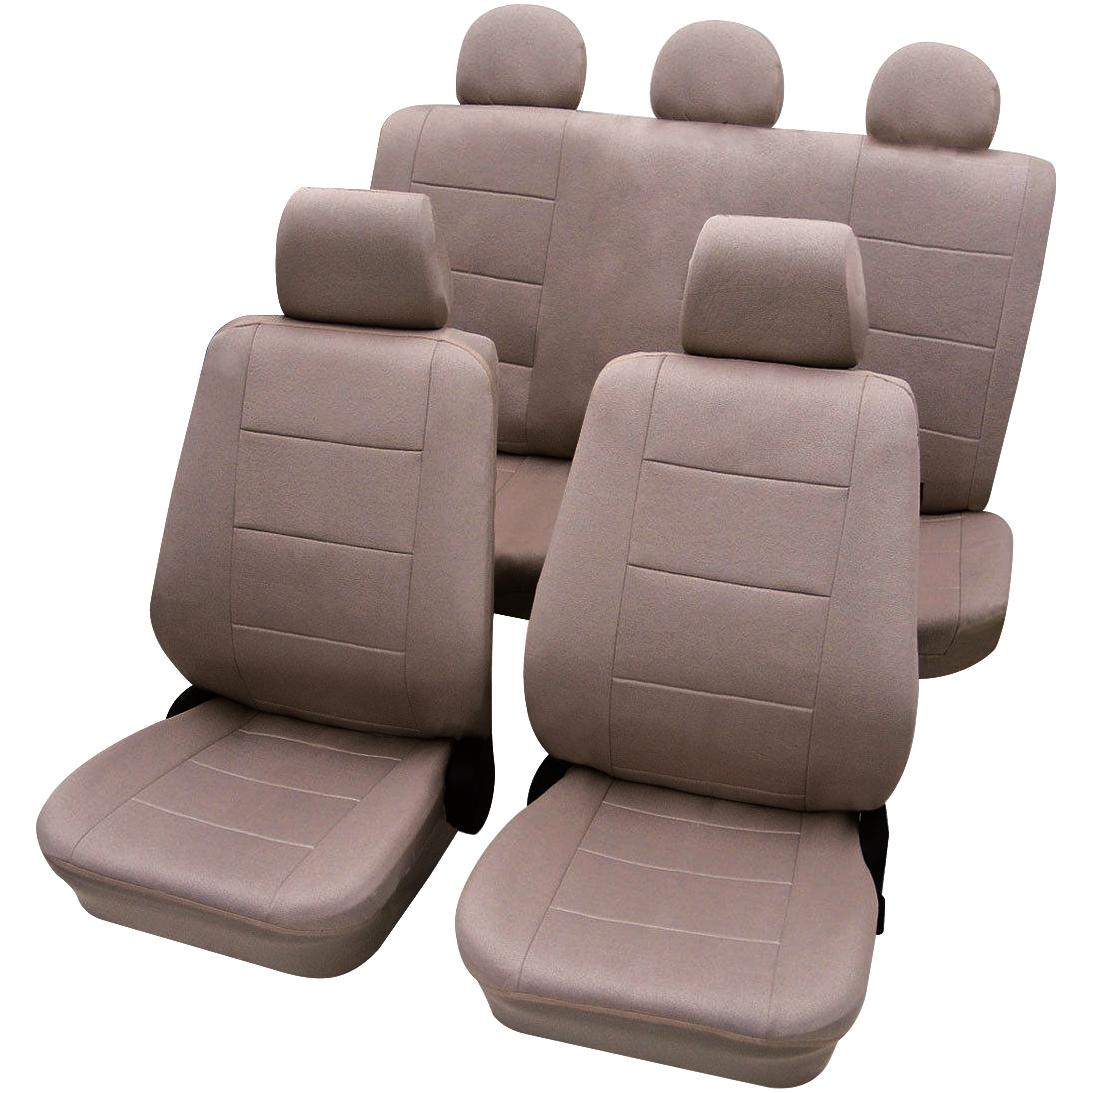 auto sitzbez ge sitzbezug schonbez ge schonbezug schoner universal farbwahl 282 ebay. Black Bedroom Furniture Sets. Home Design Ideas